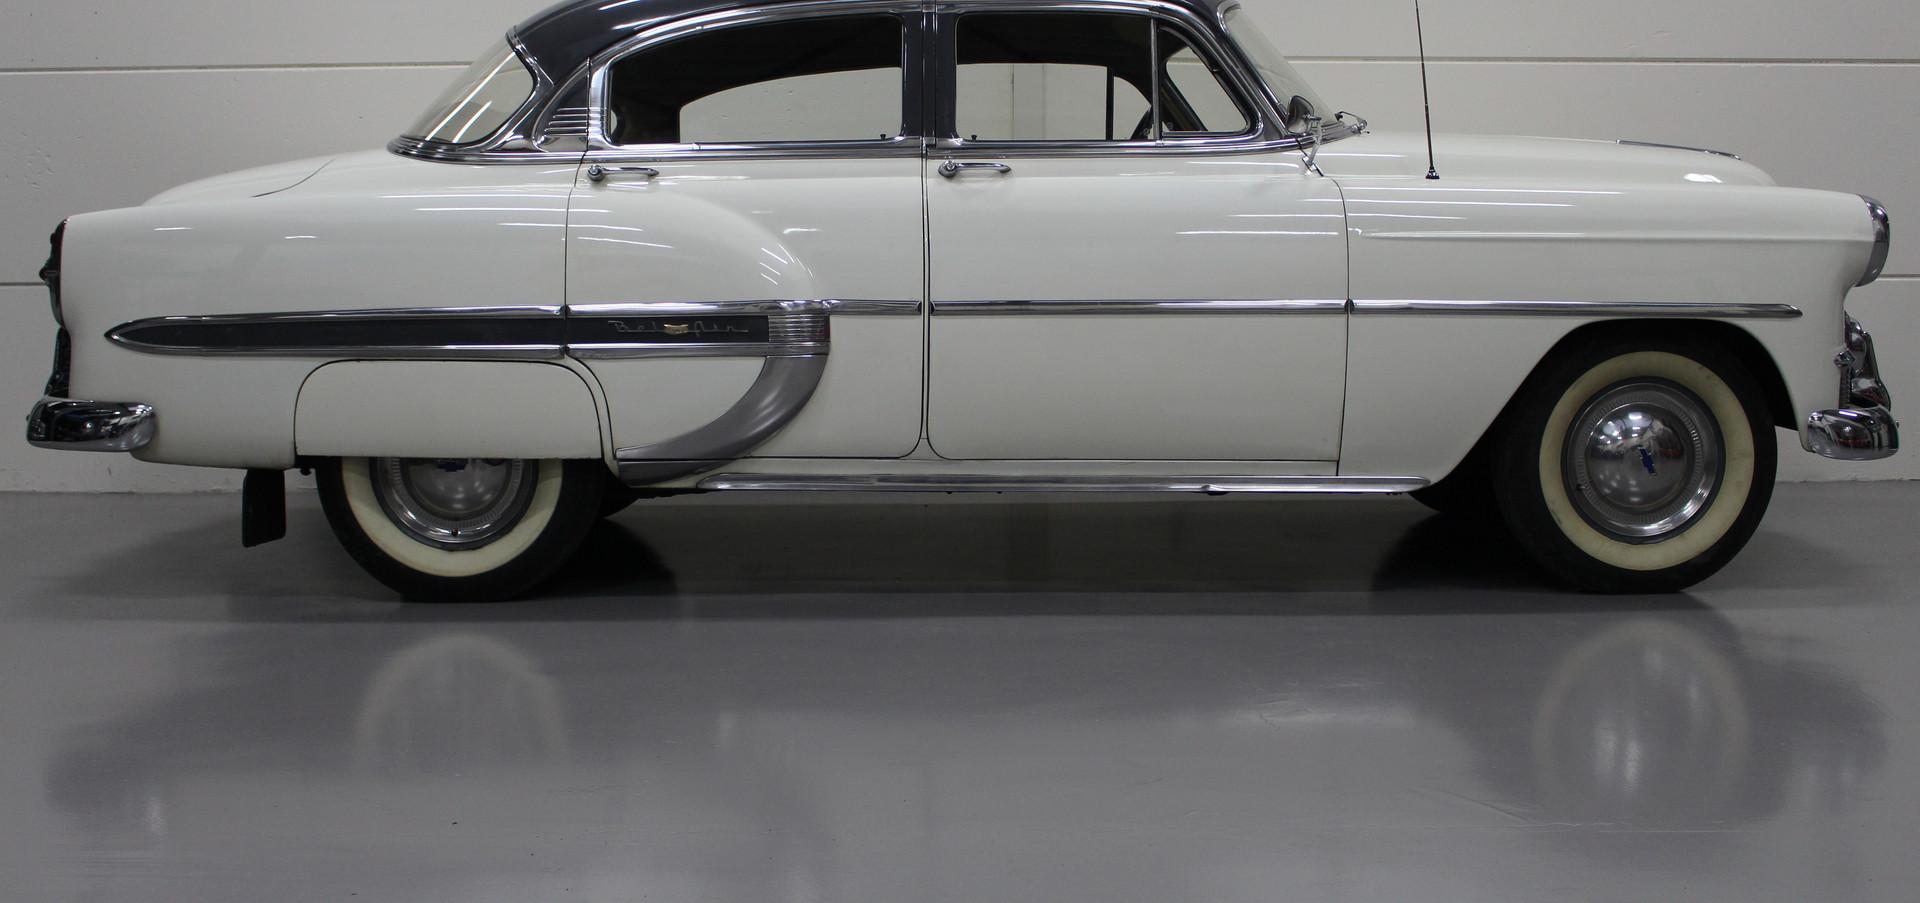 Chevrolet_BelAIr_1953_9.JPG